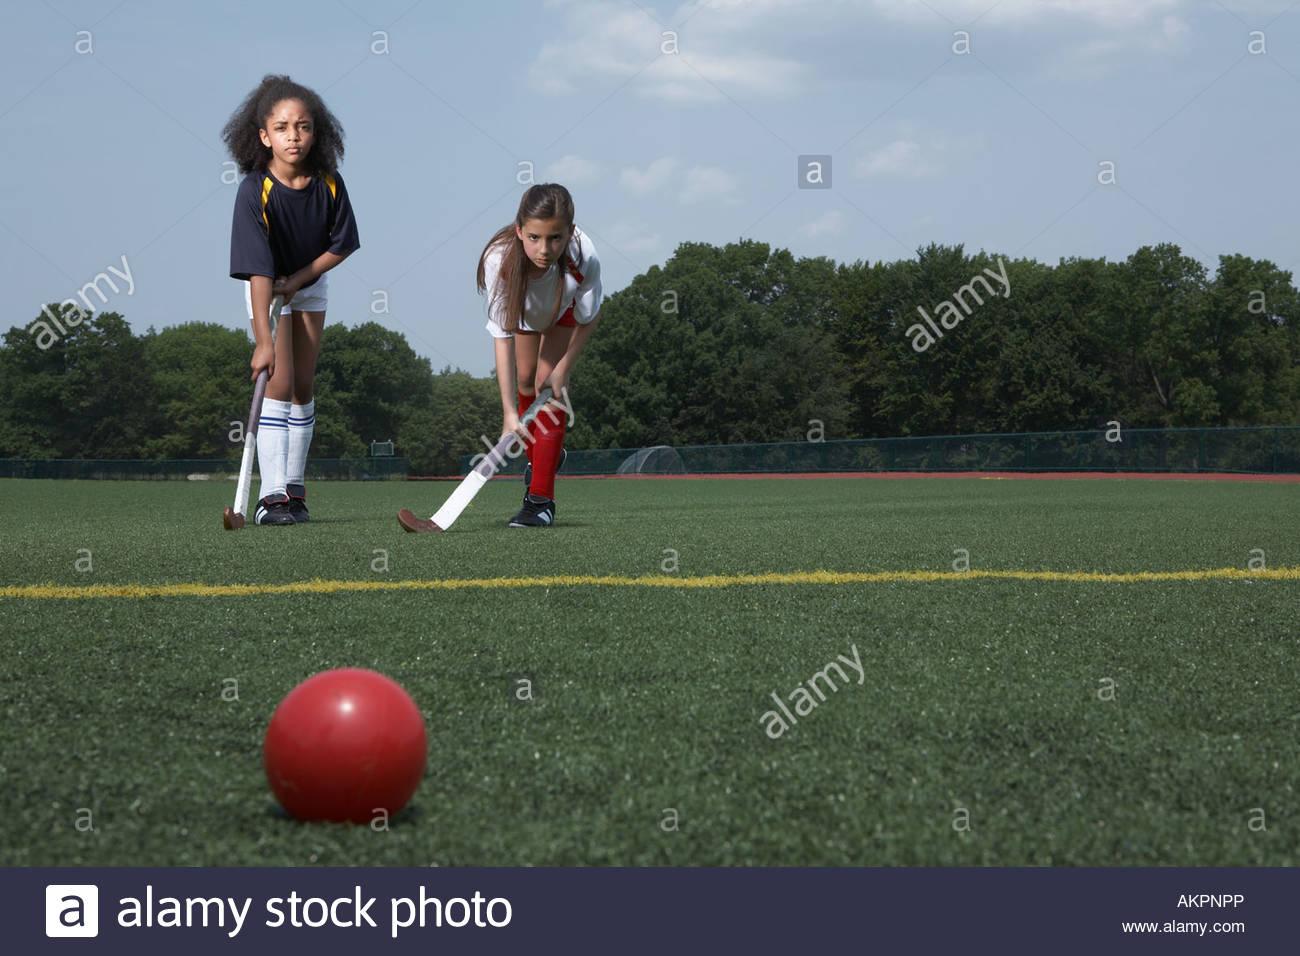 Two girls playing hockey - Stock Image